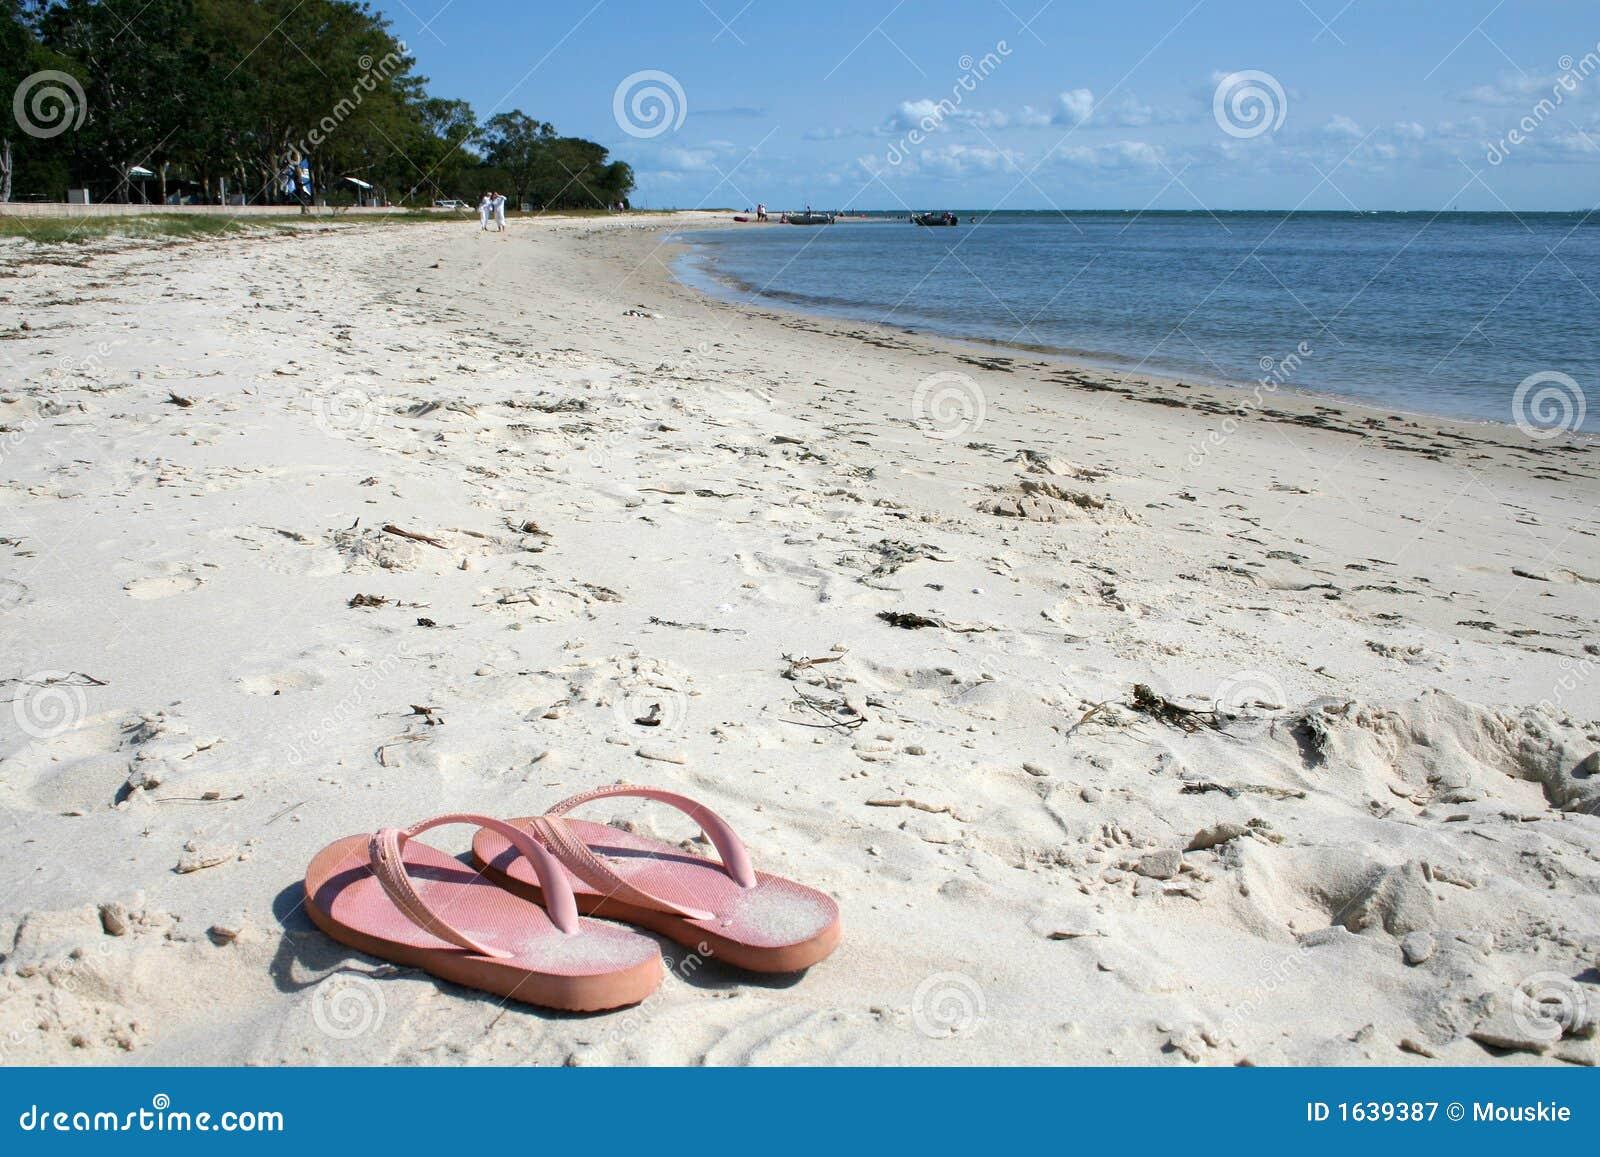 f26250e62ae599 Thongs on the Beach stock image. Image of sand